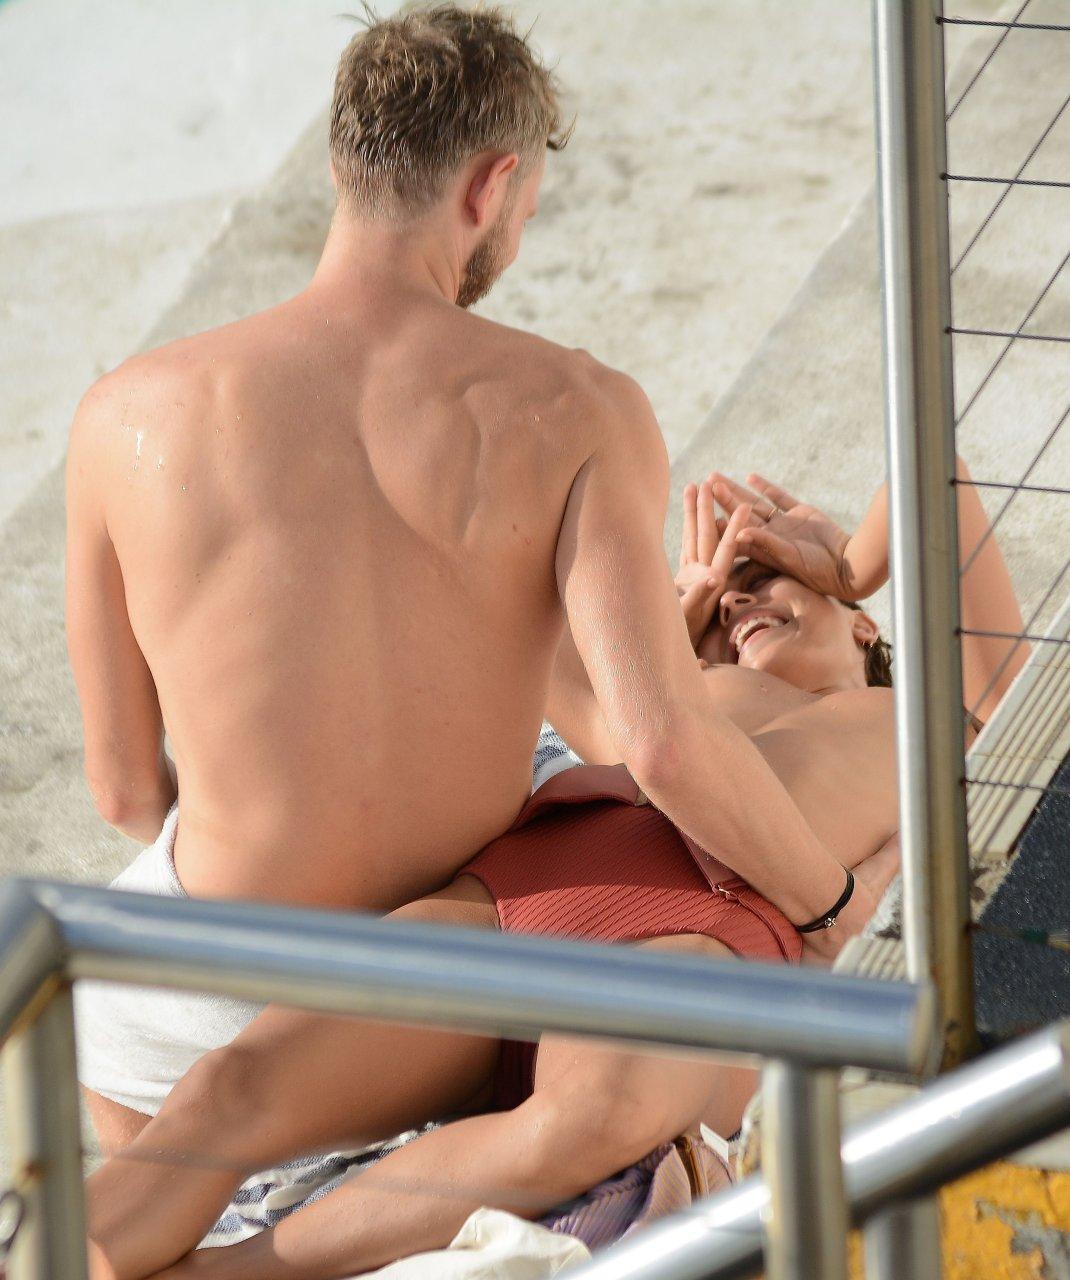 people fucking in public nude